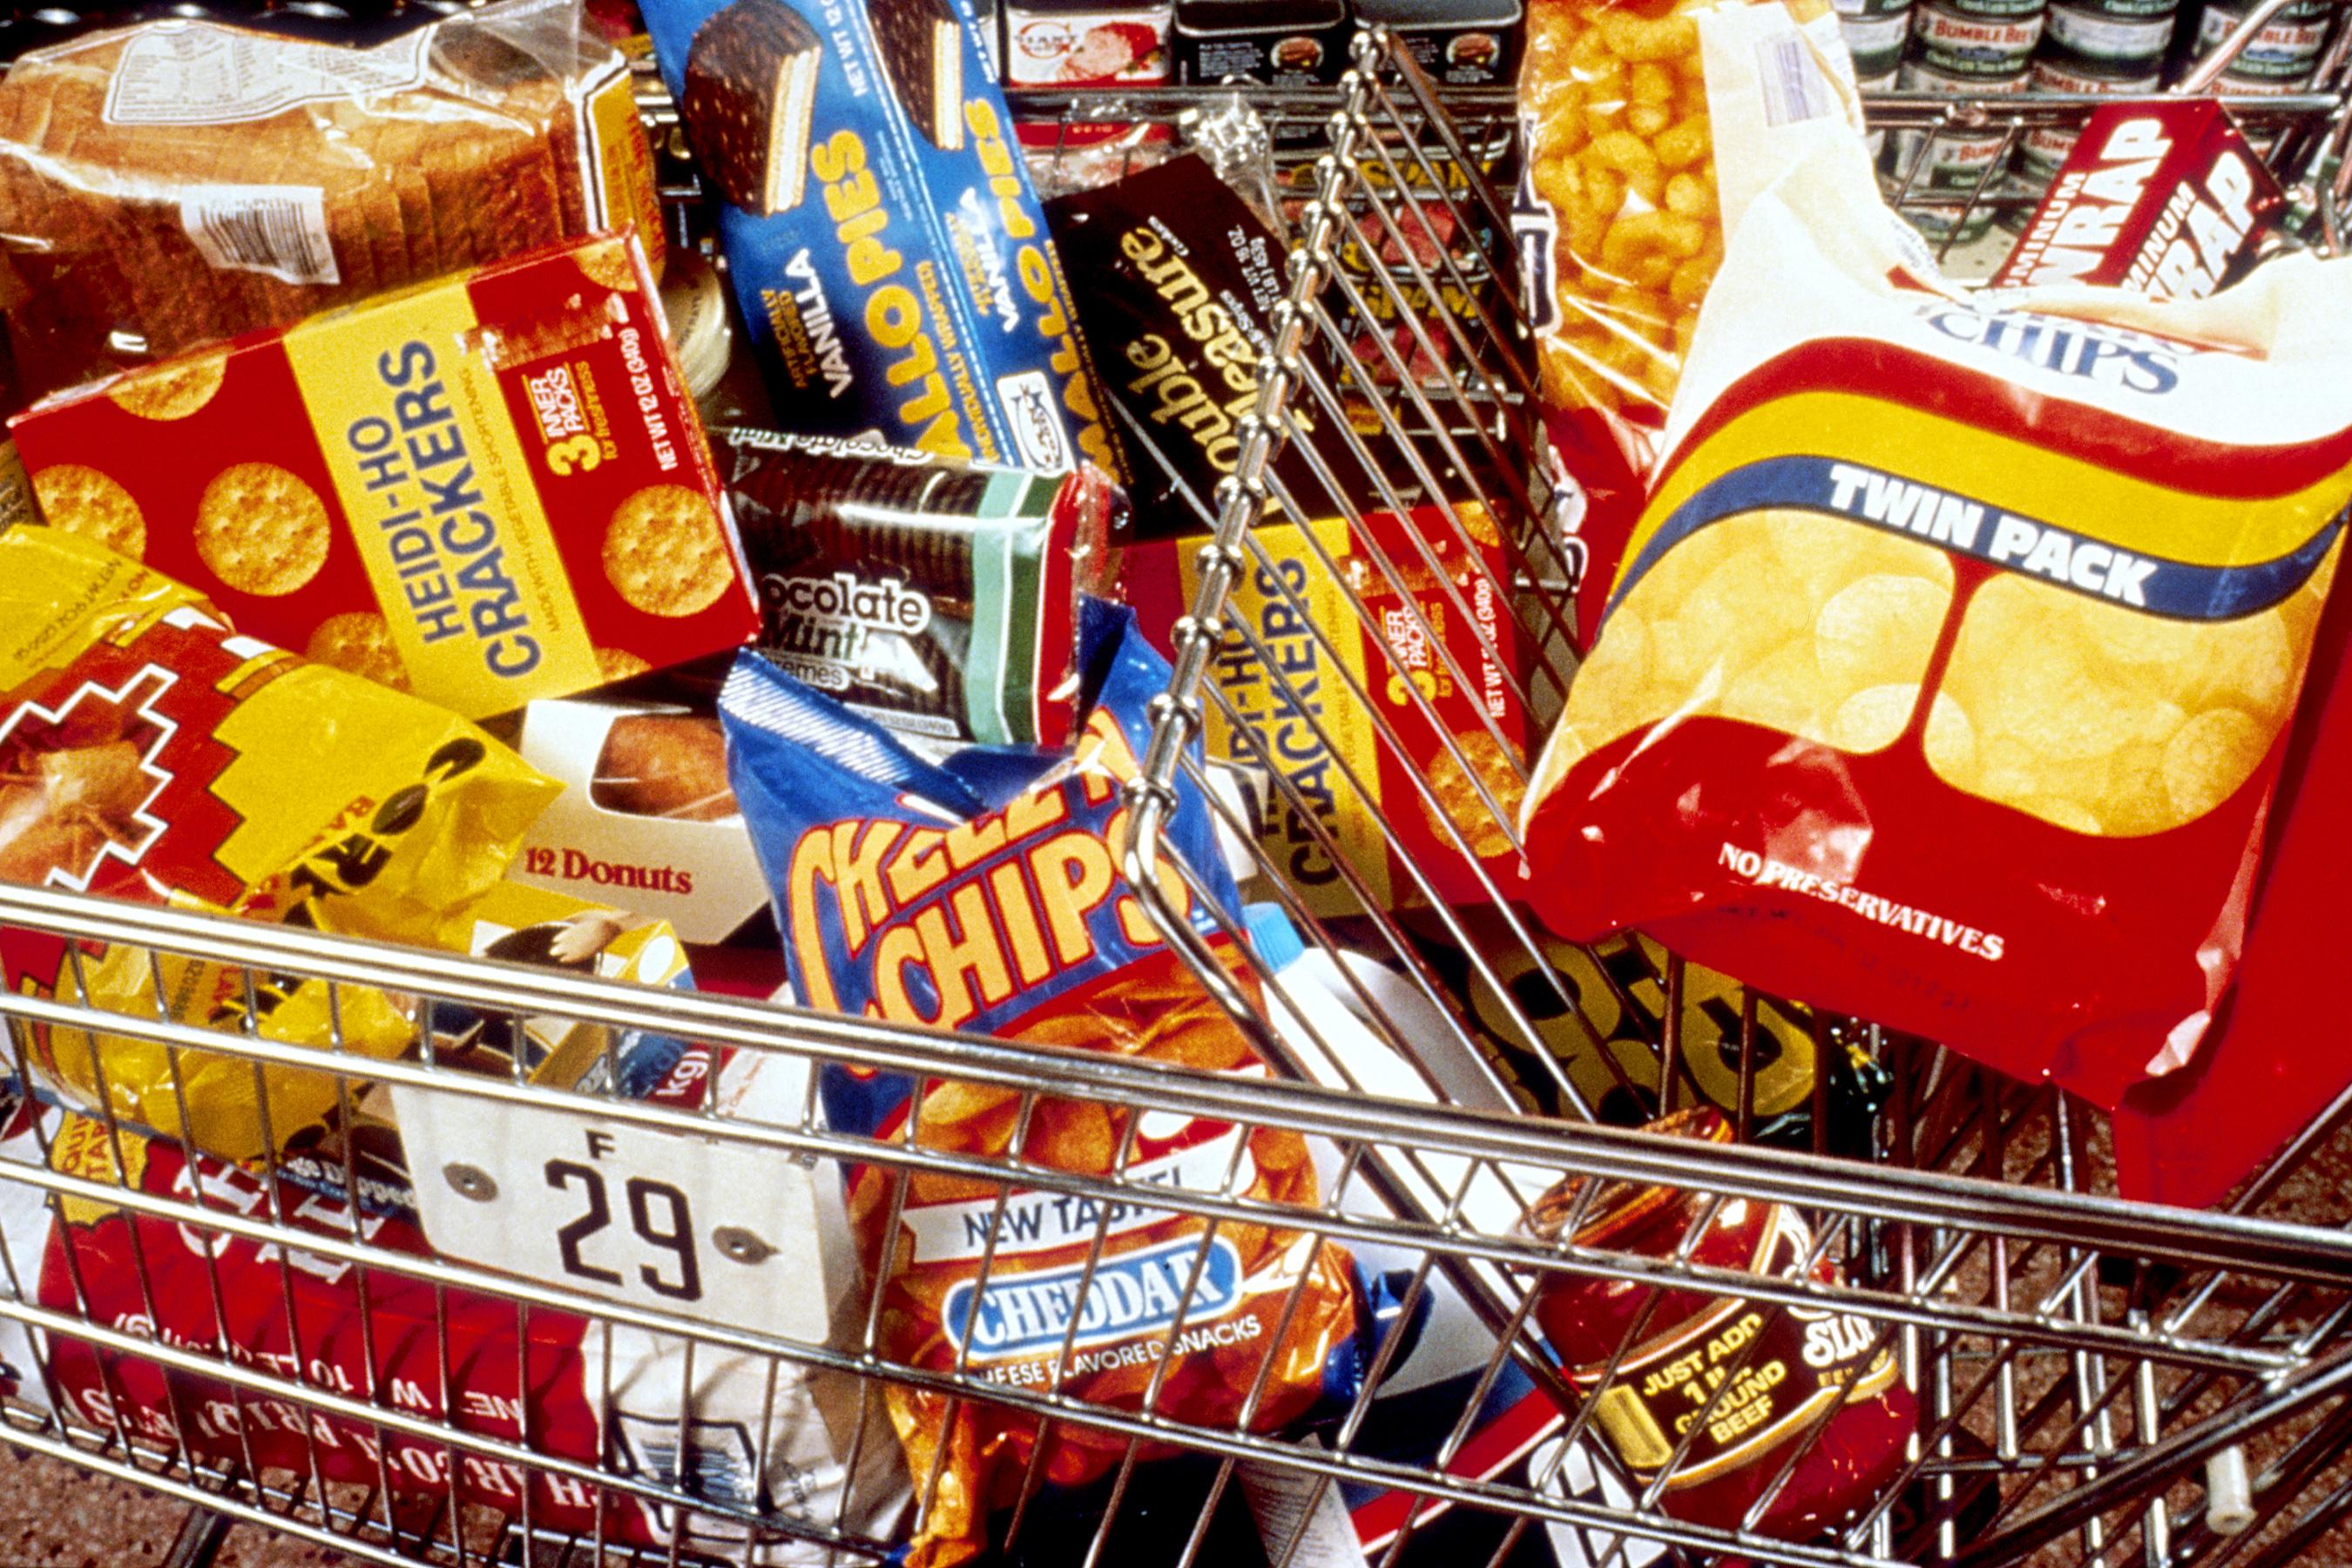 File:Unhealthy snacks in cart.jpg - Wikimedia Commons